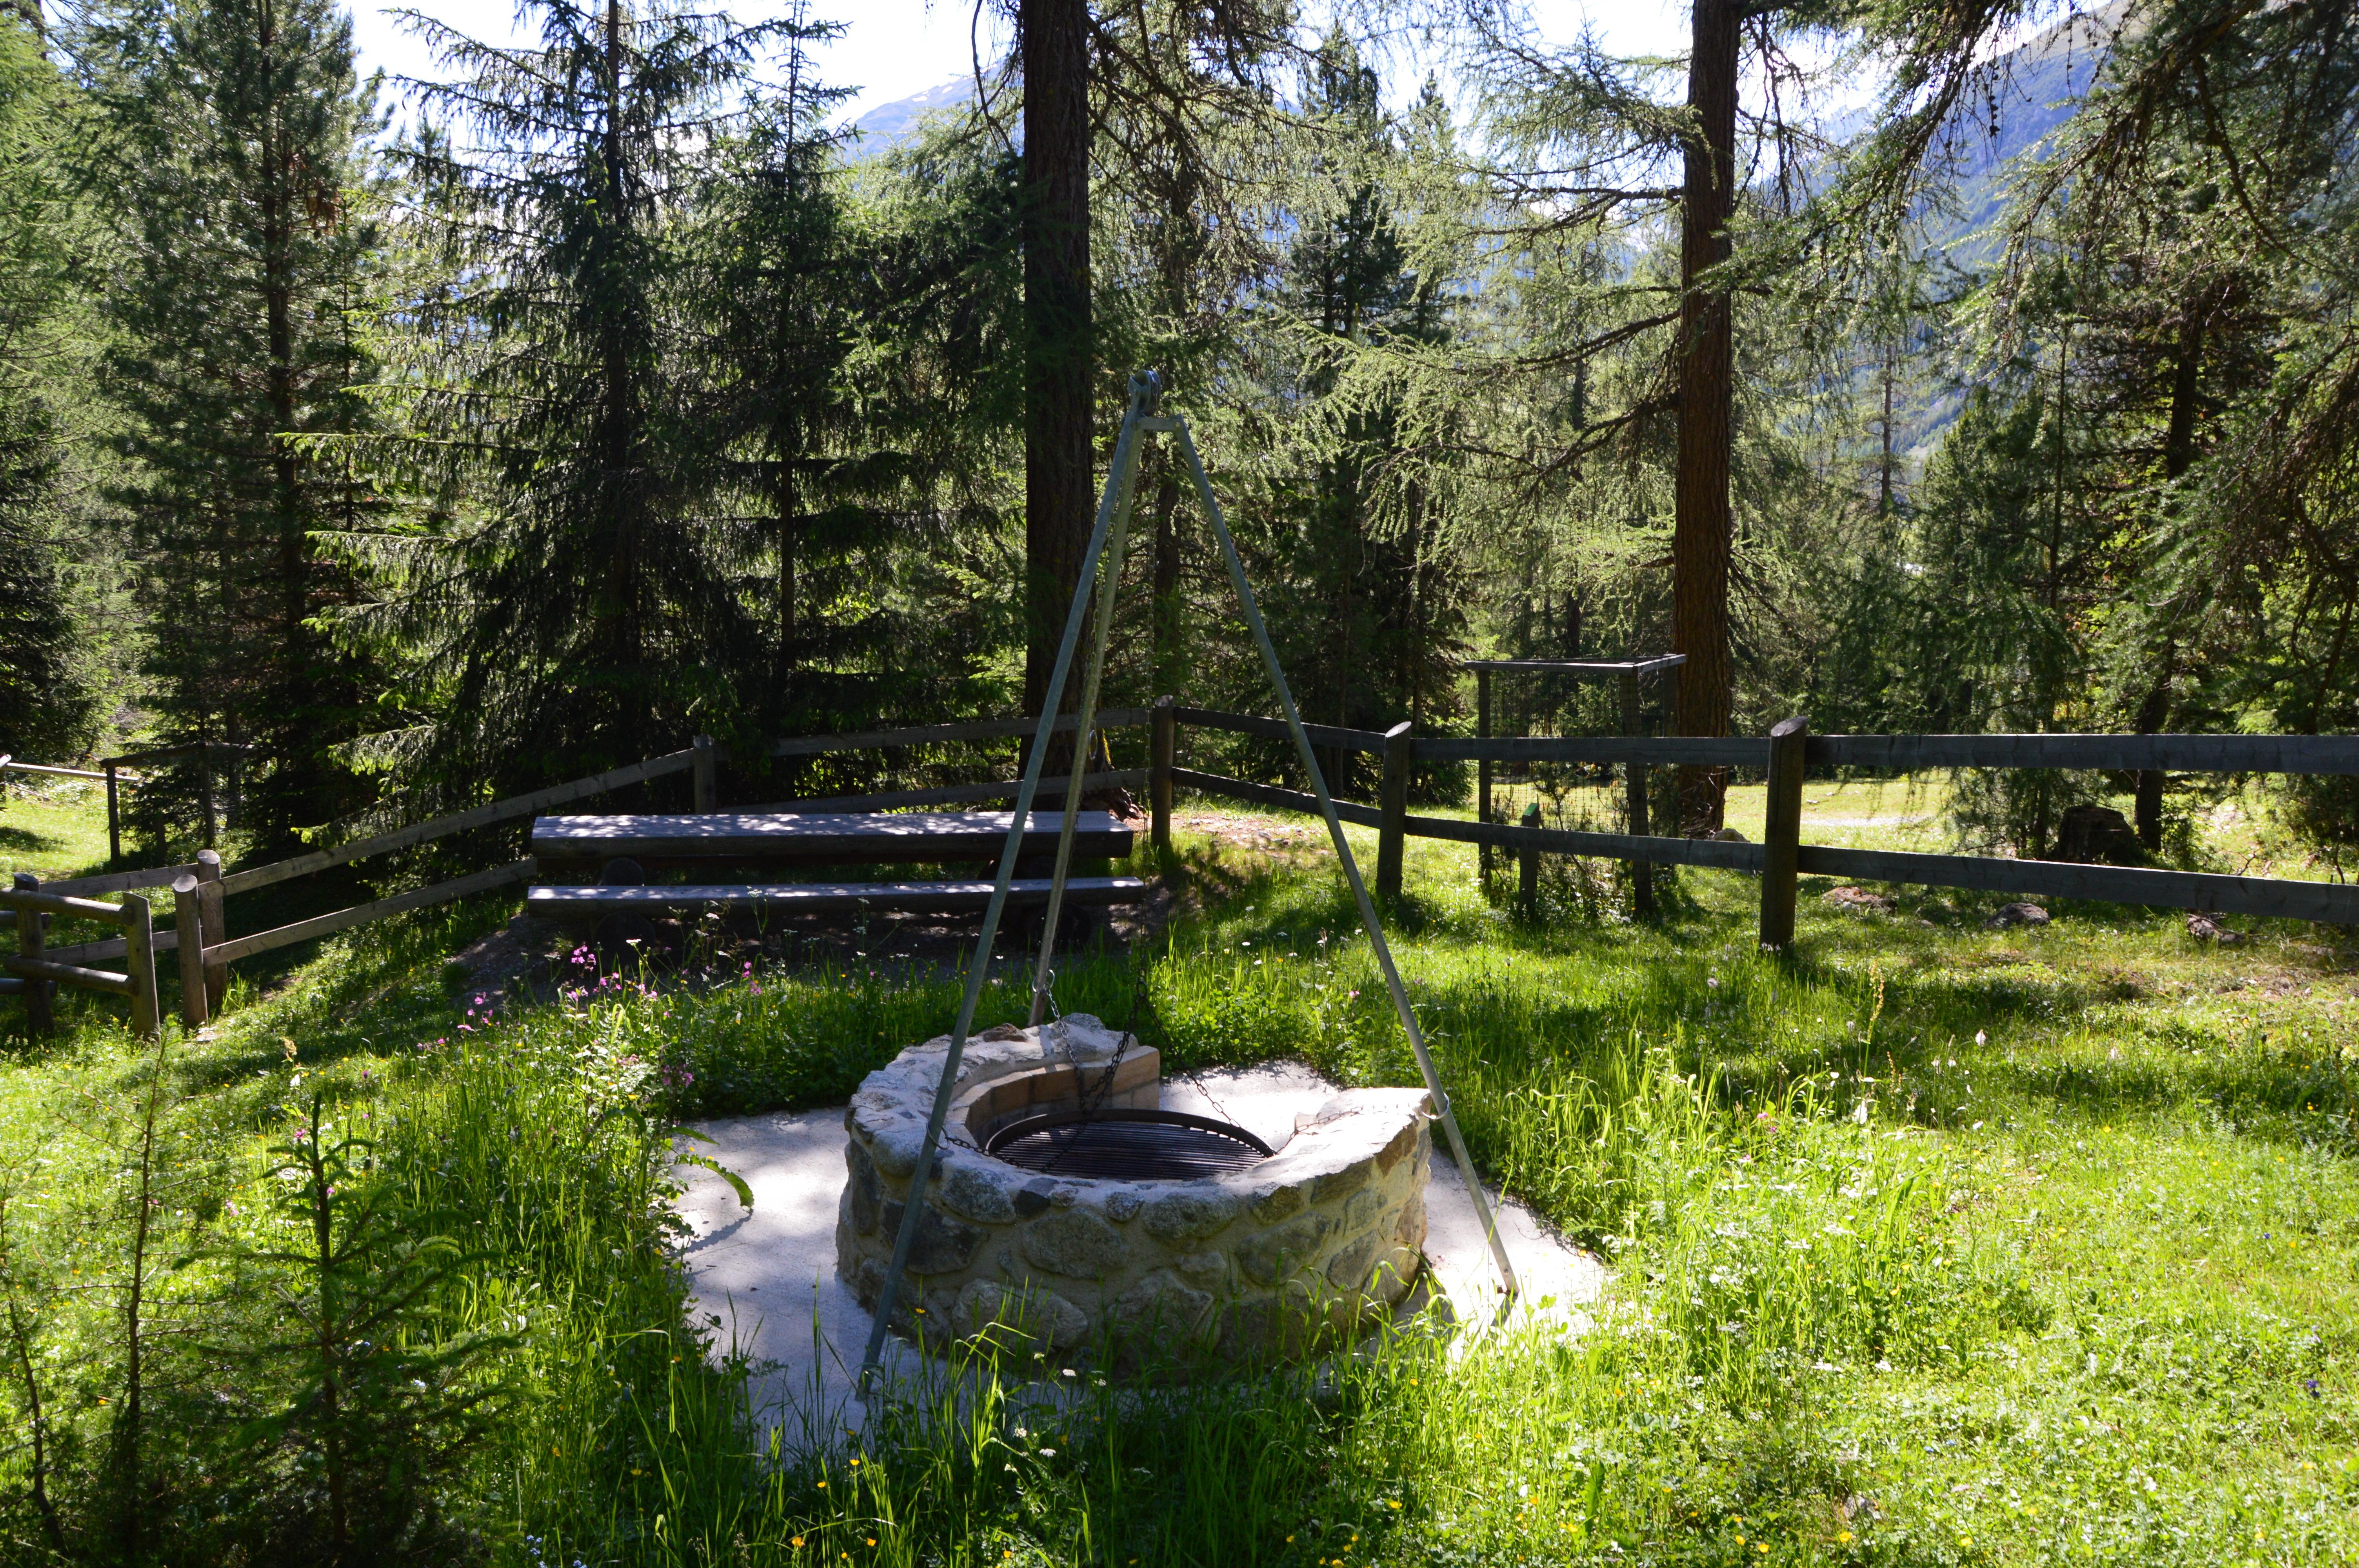 Feuerstelle Waldlehrpfad Slide 1